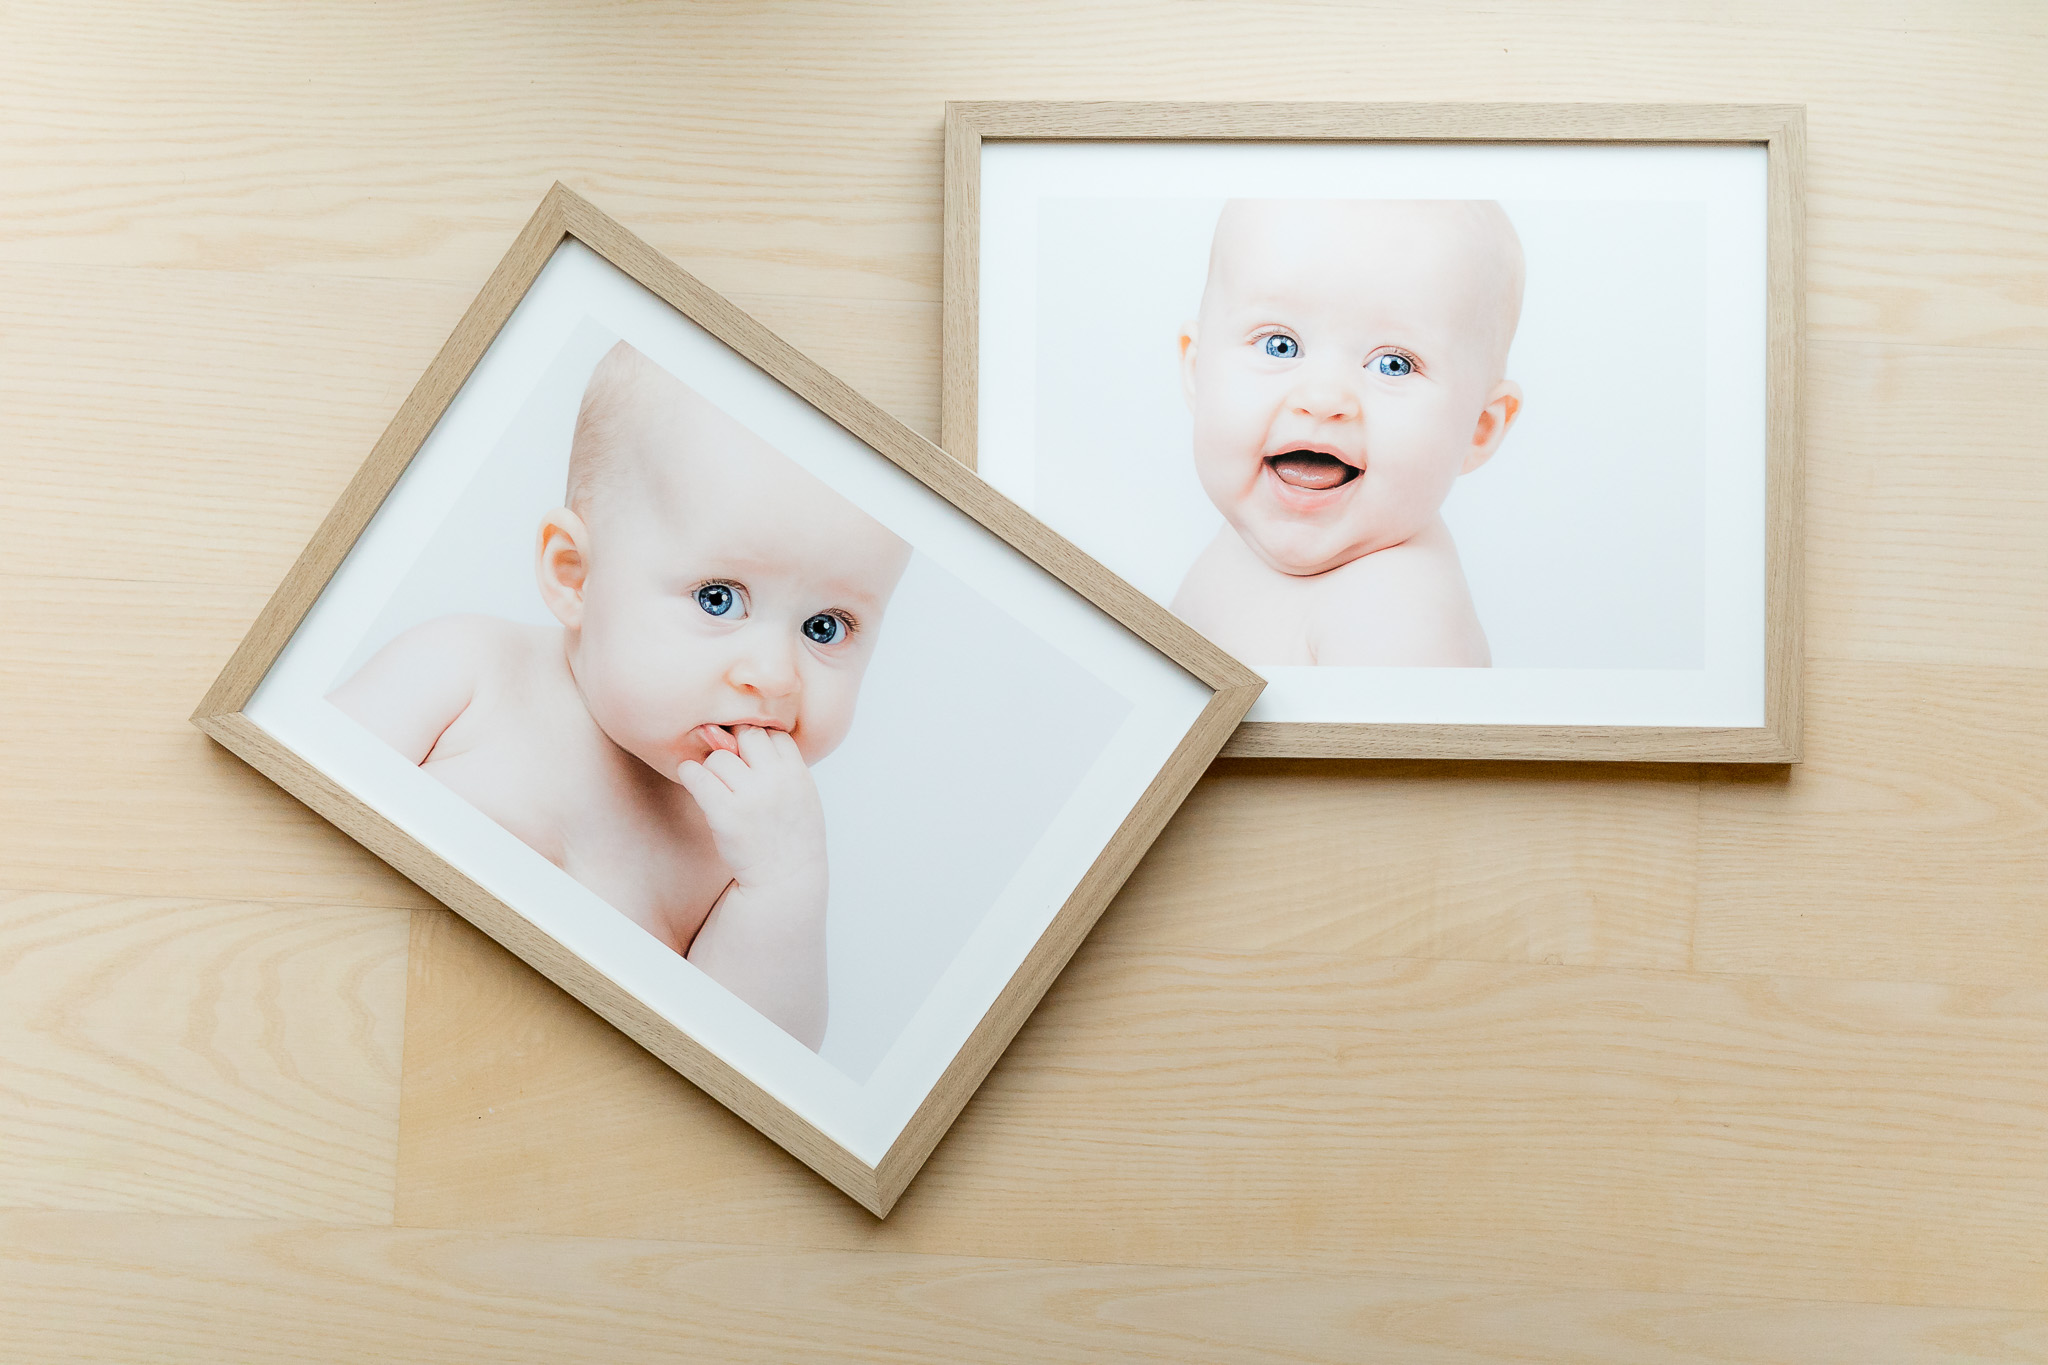 fotoprint kvalitet